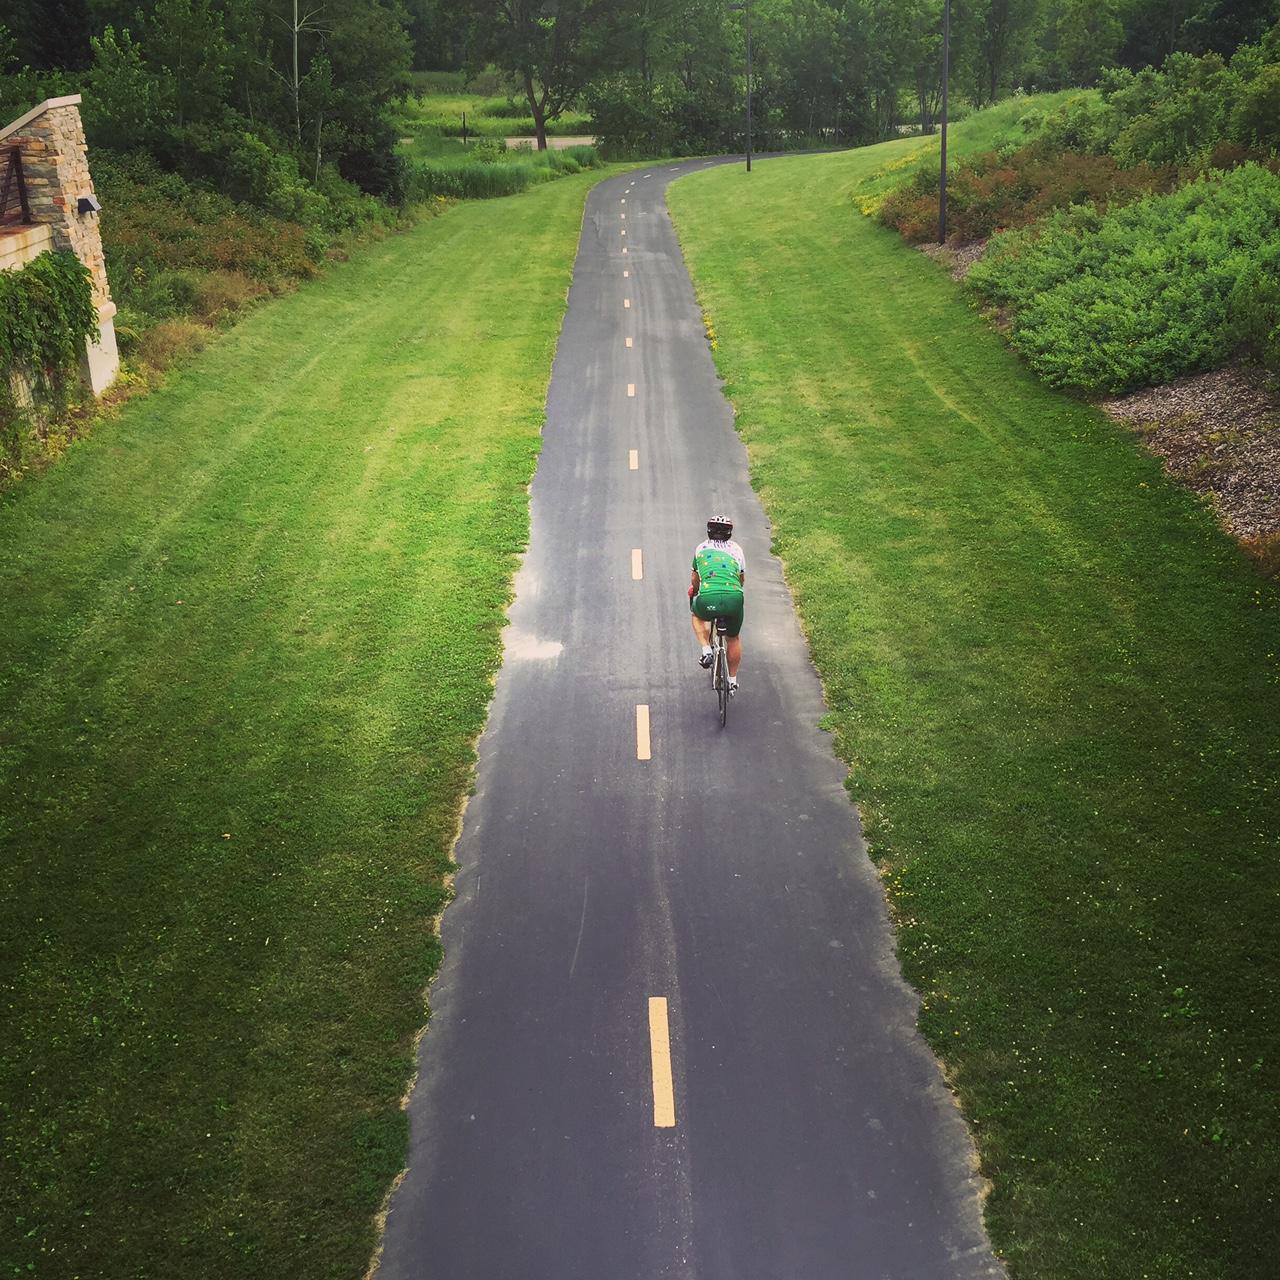 Person on bike path